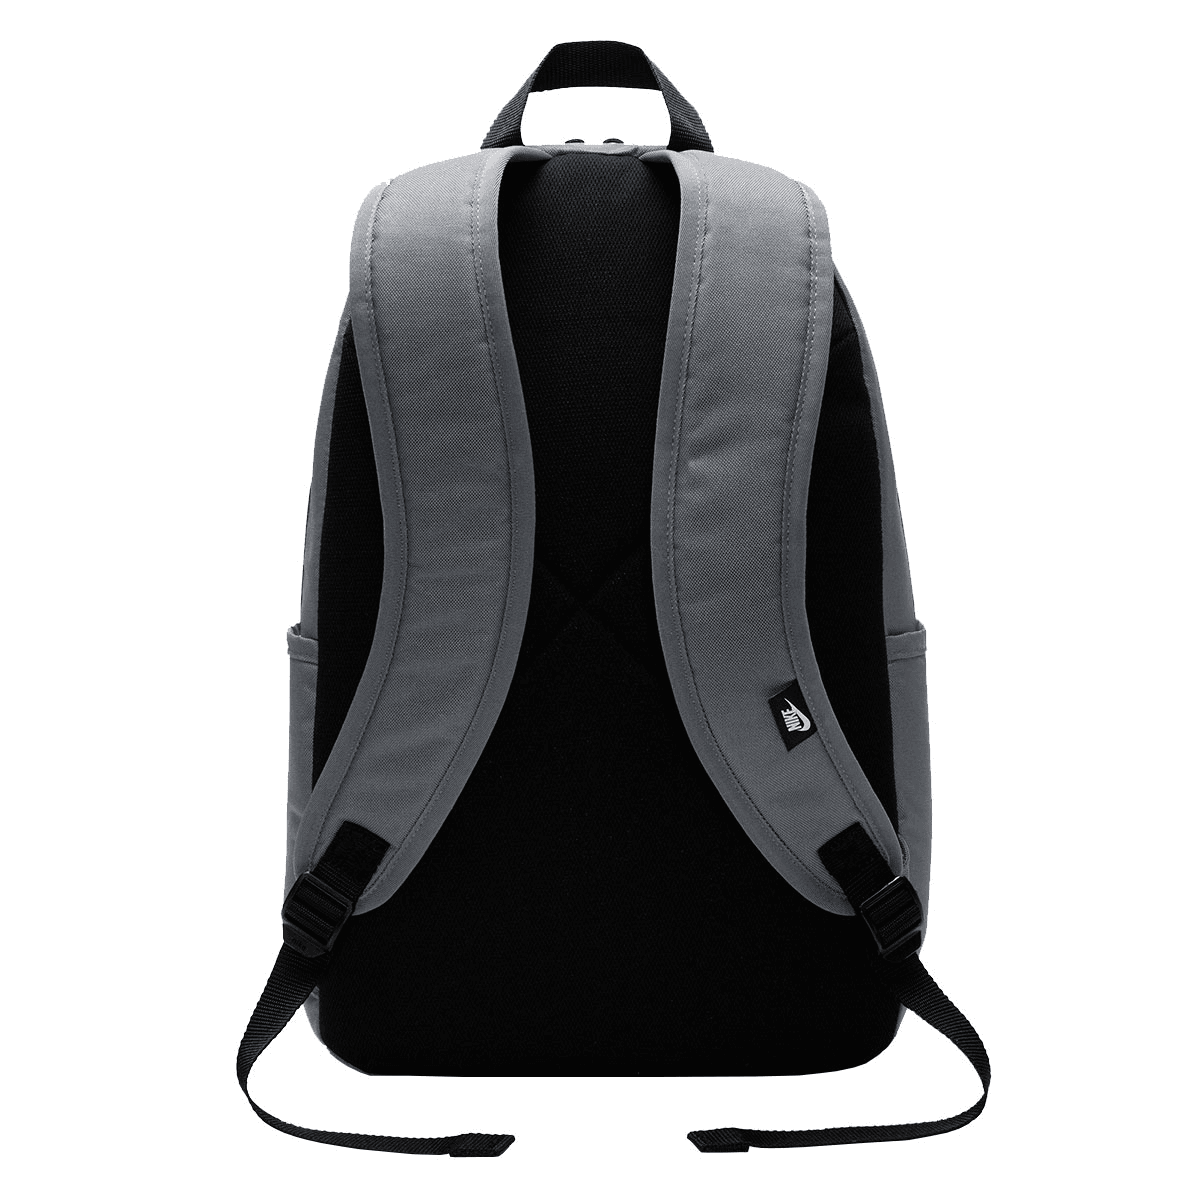 812a576624c91 Nike Rucksack grau schwarz - Fussball Shop